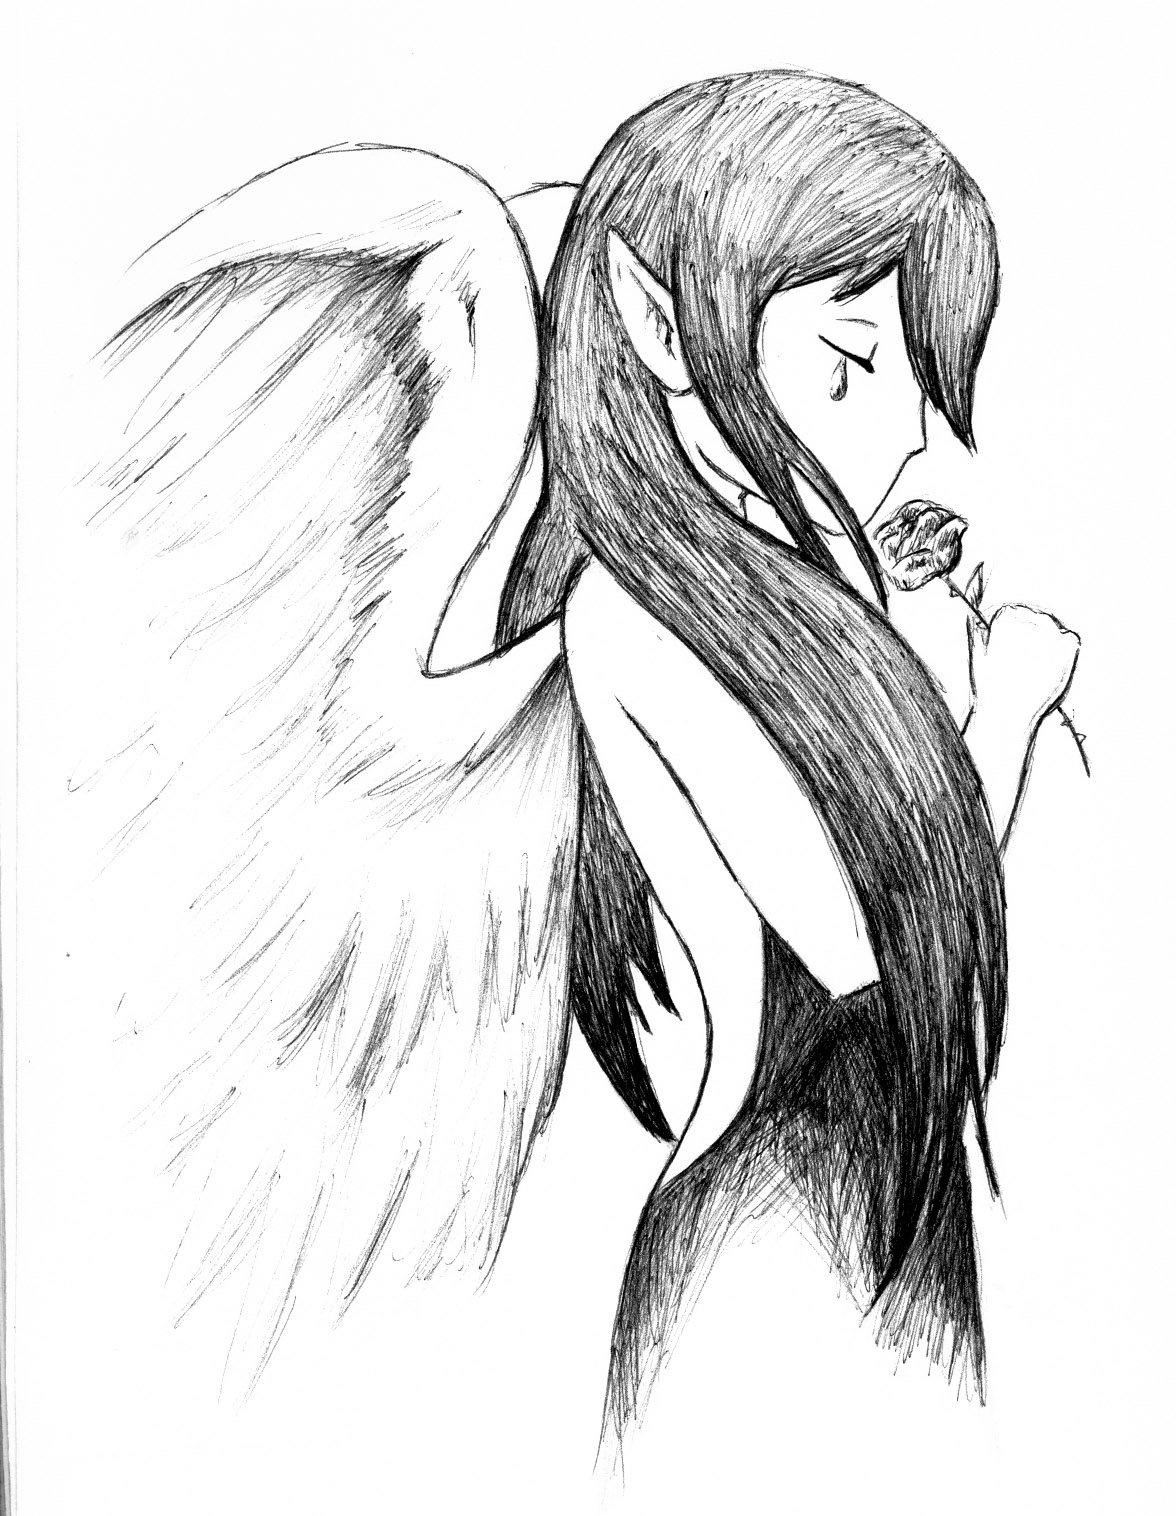 1176x1516 Sad Angel Anime Drawings In Pencil Sad Angel By Yomalyn